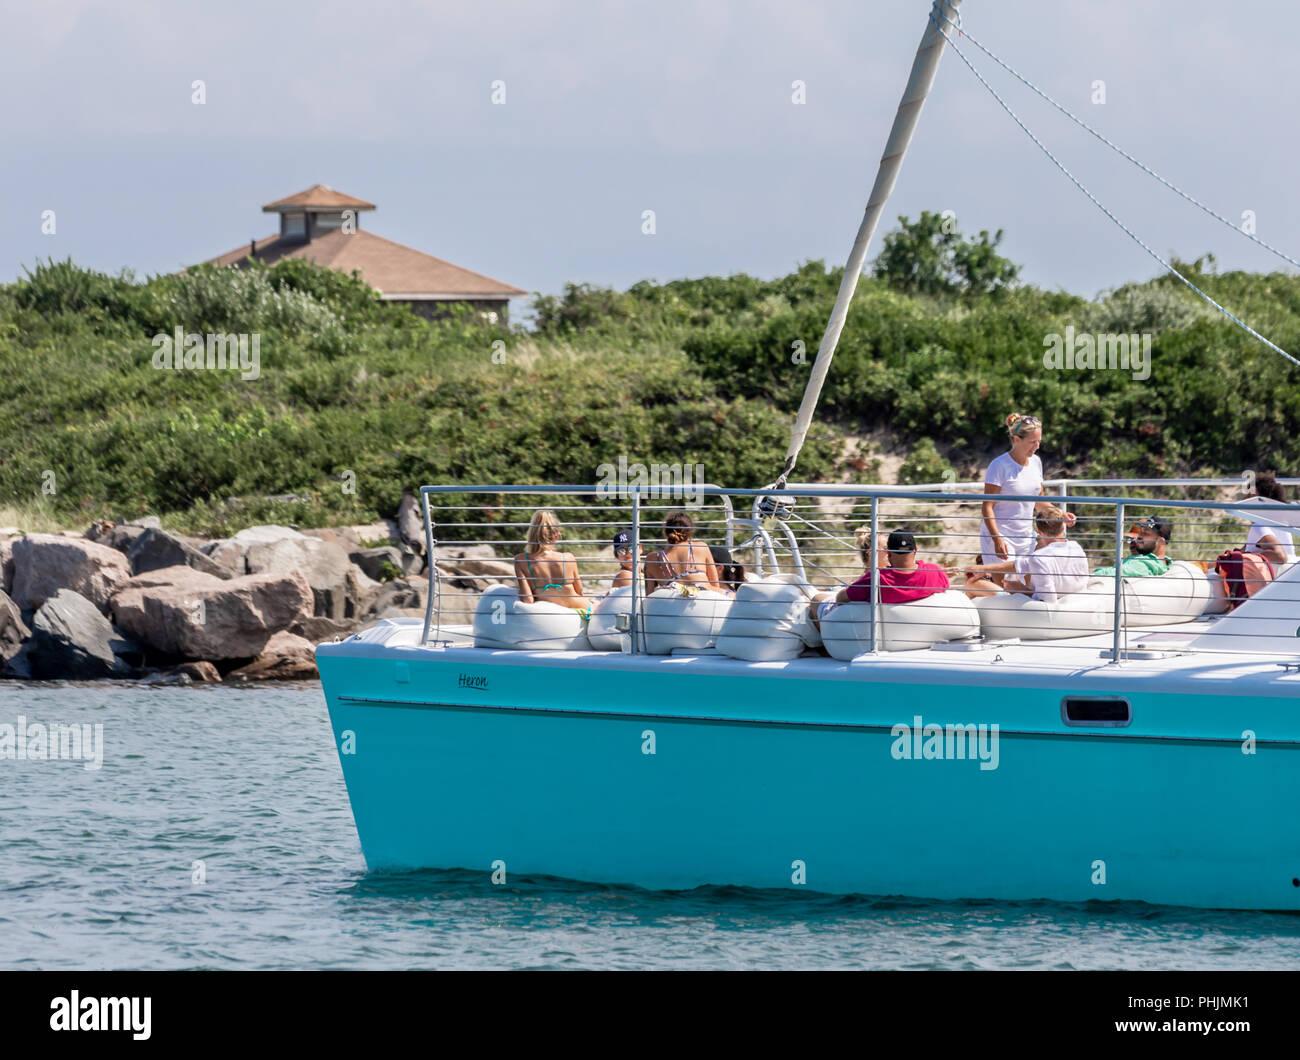 girl in bikini on boat